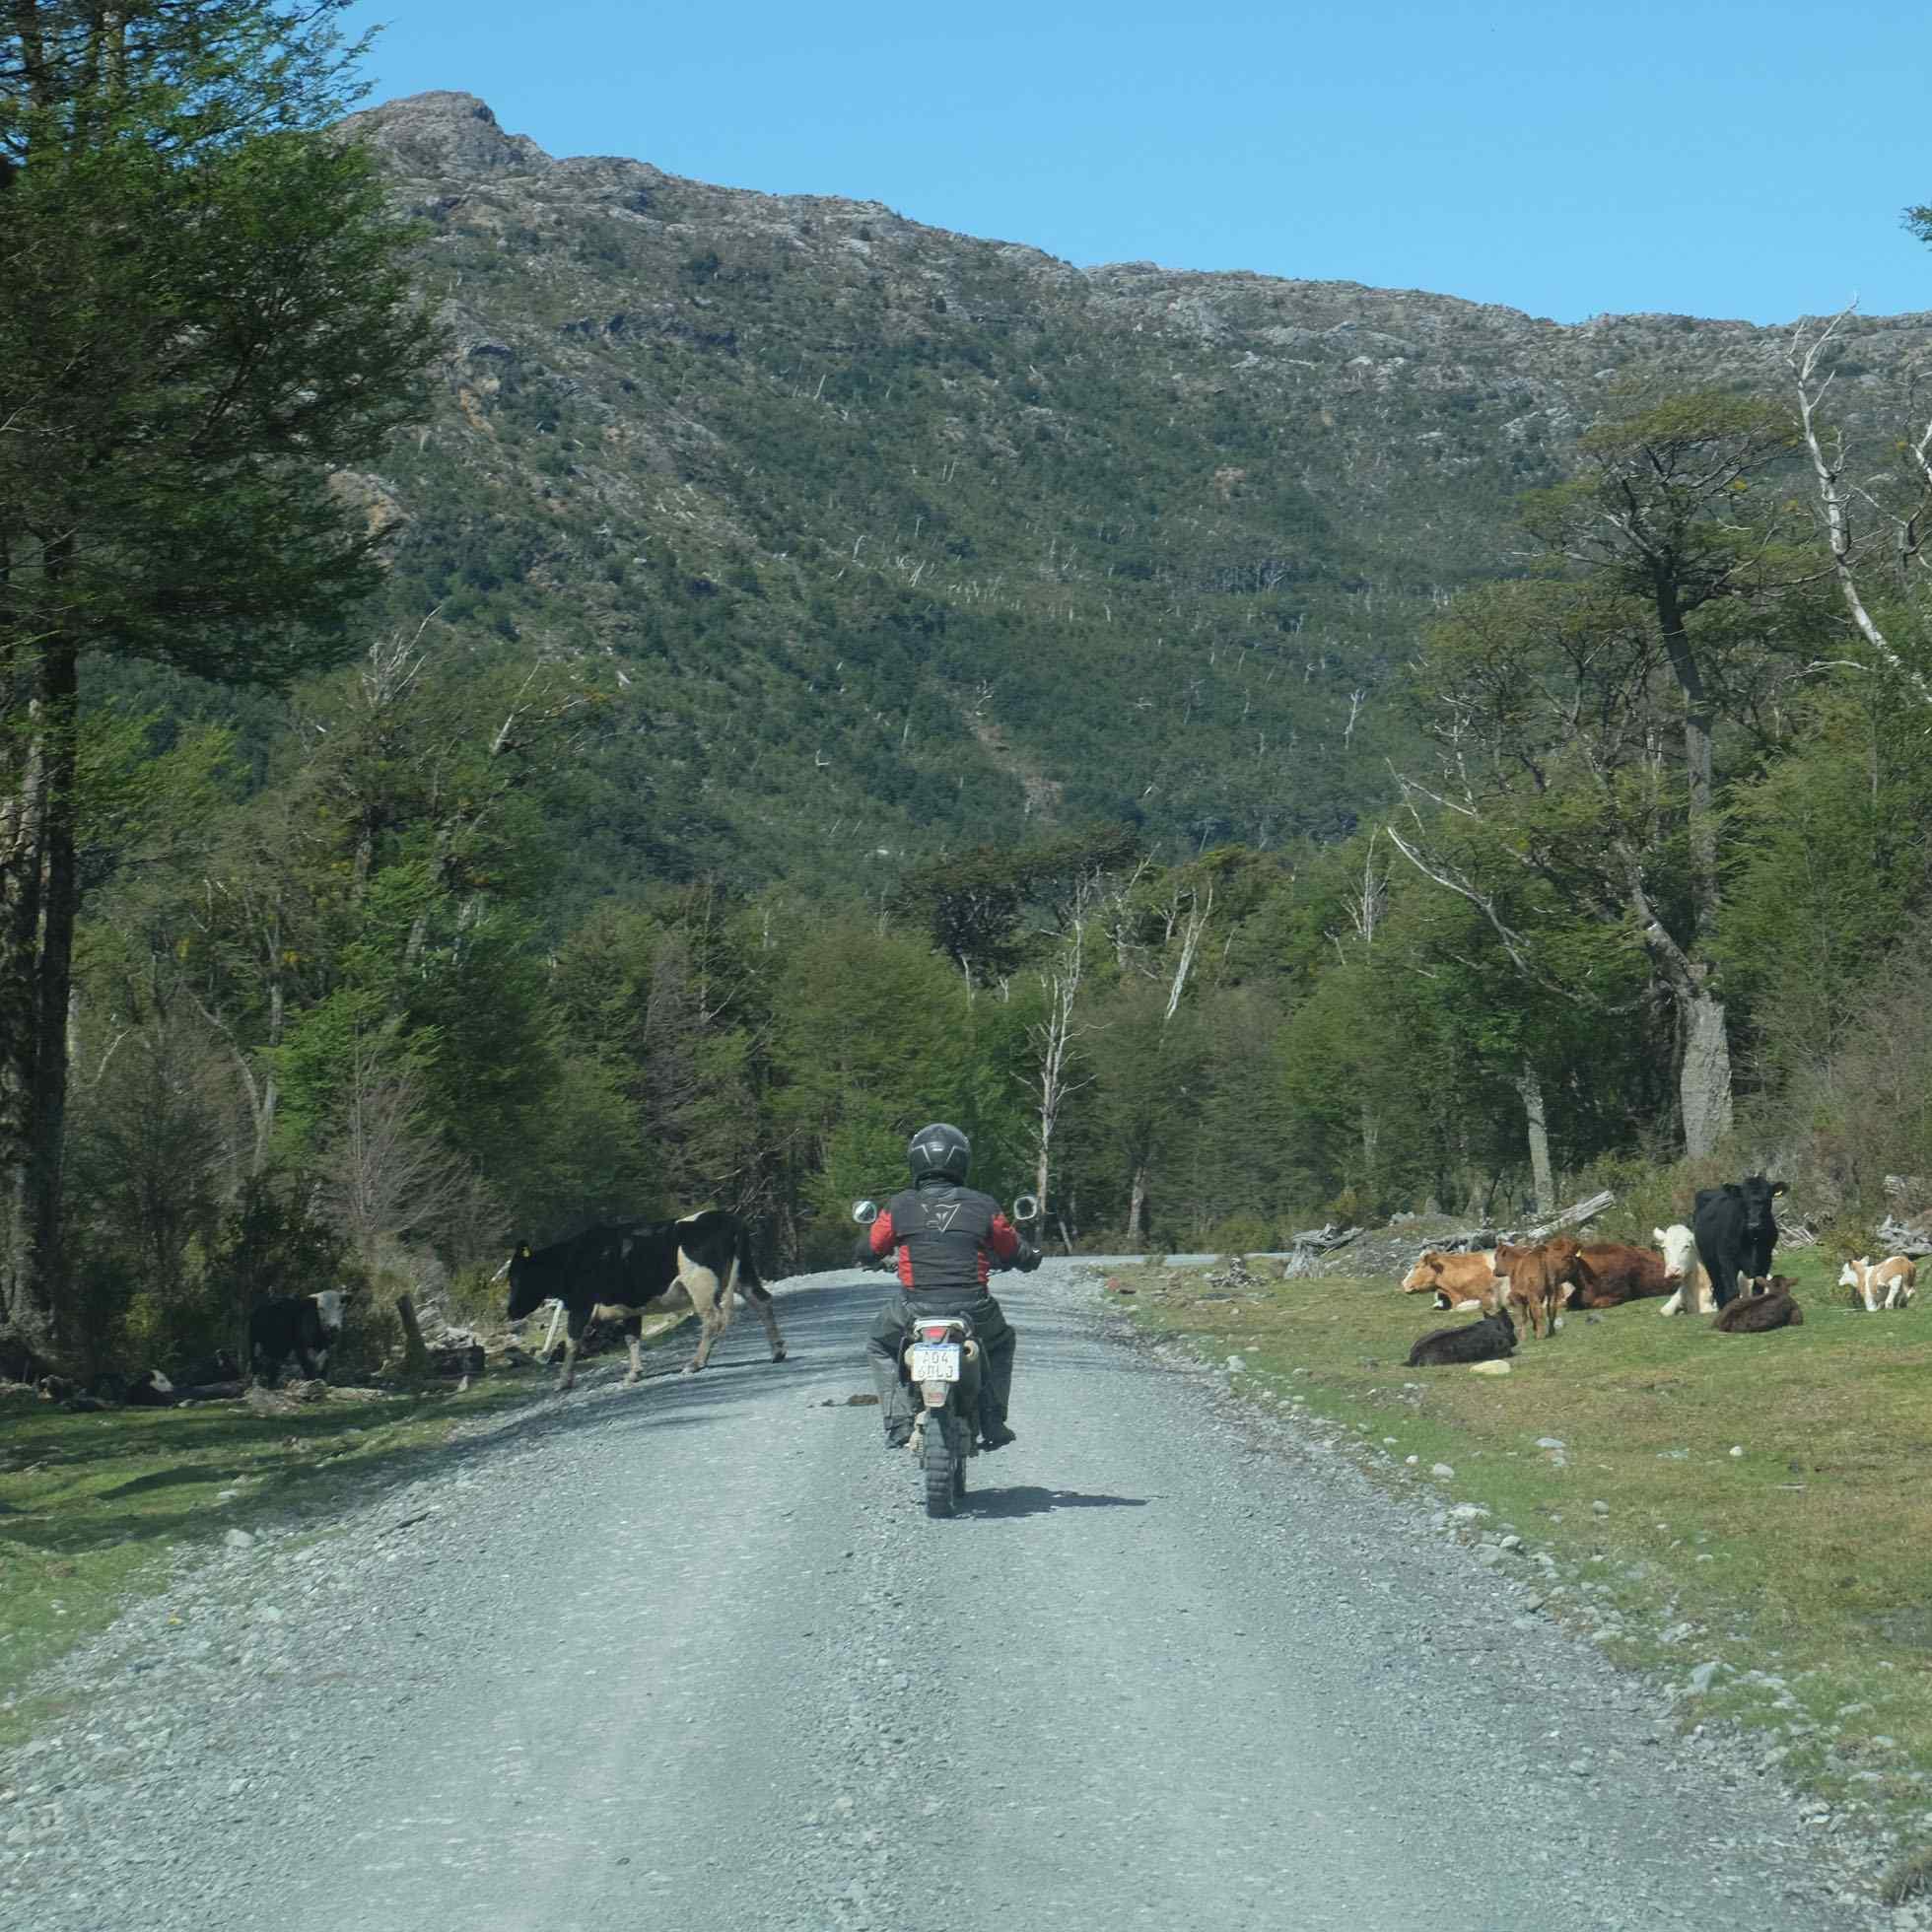 Carretera Austral @Enduro Austral